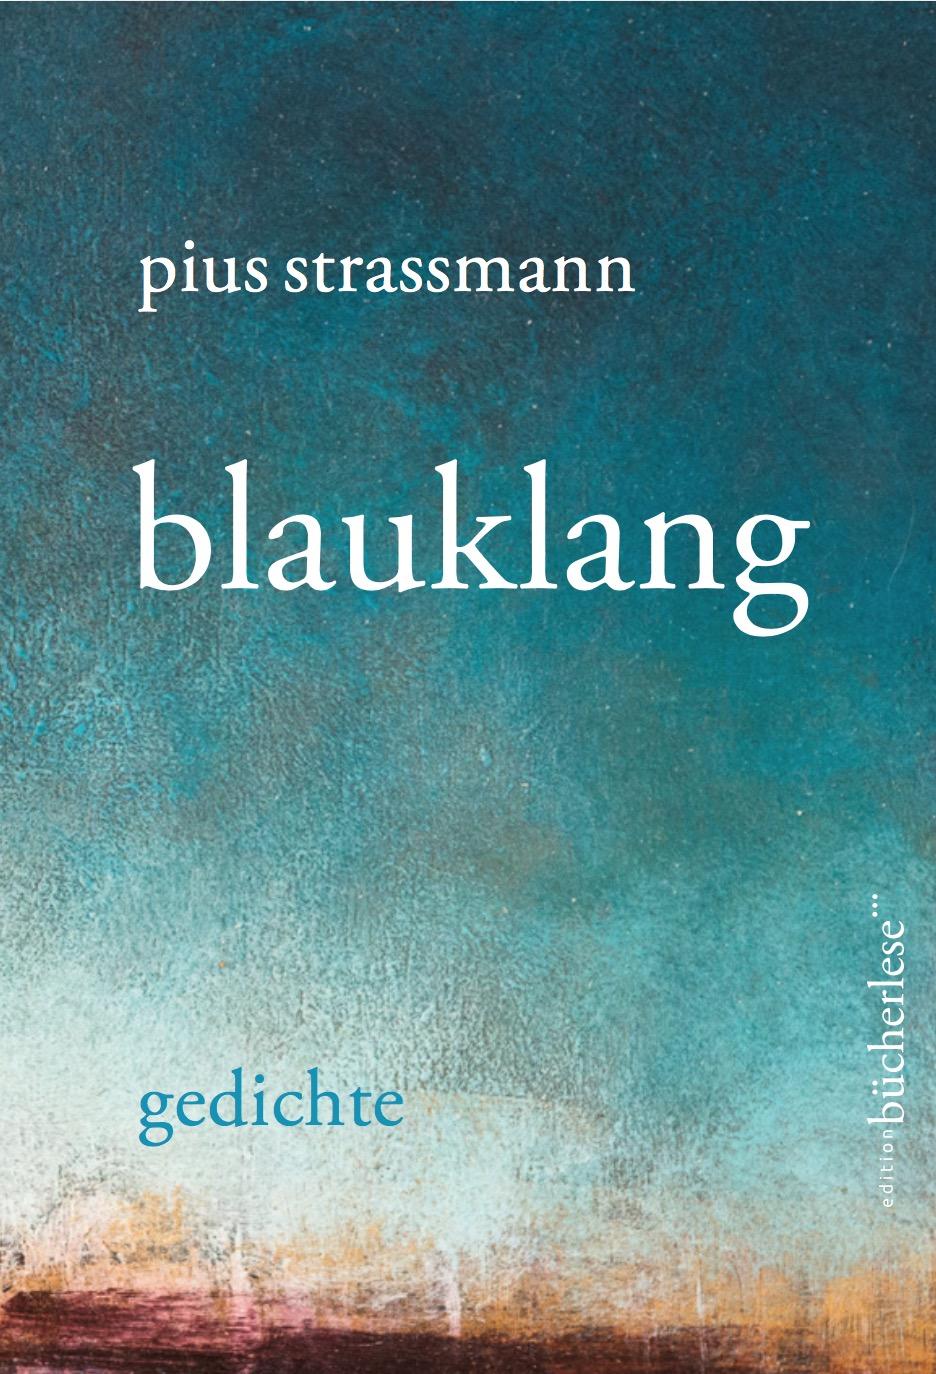 blauklang  gedichte Hardcover, Leseband ca. 128 Seiten fr. 28.-/Euro 27.-  ISBN 978-3-9524082-8-5